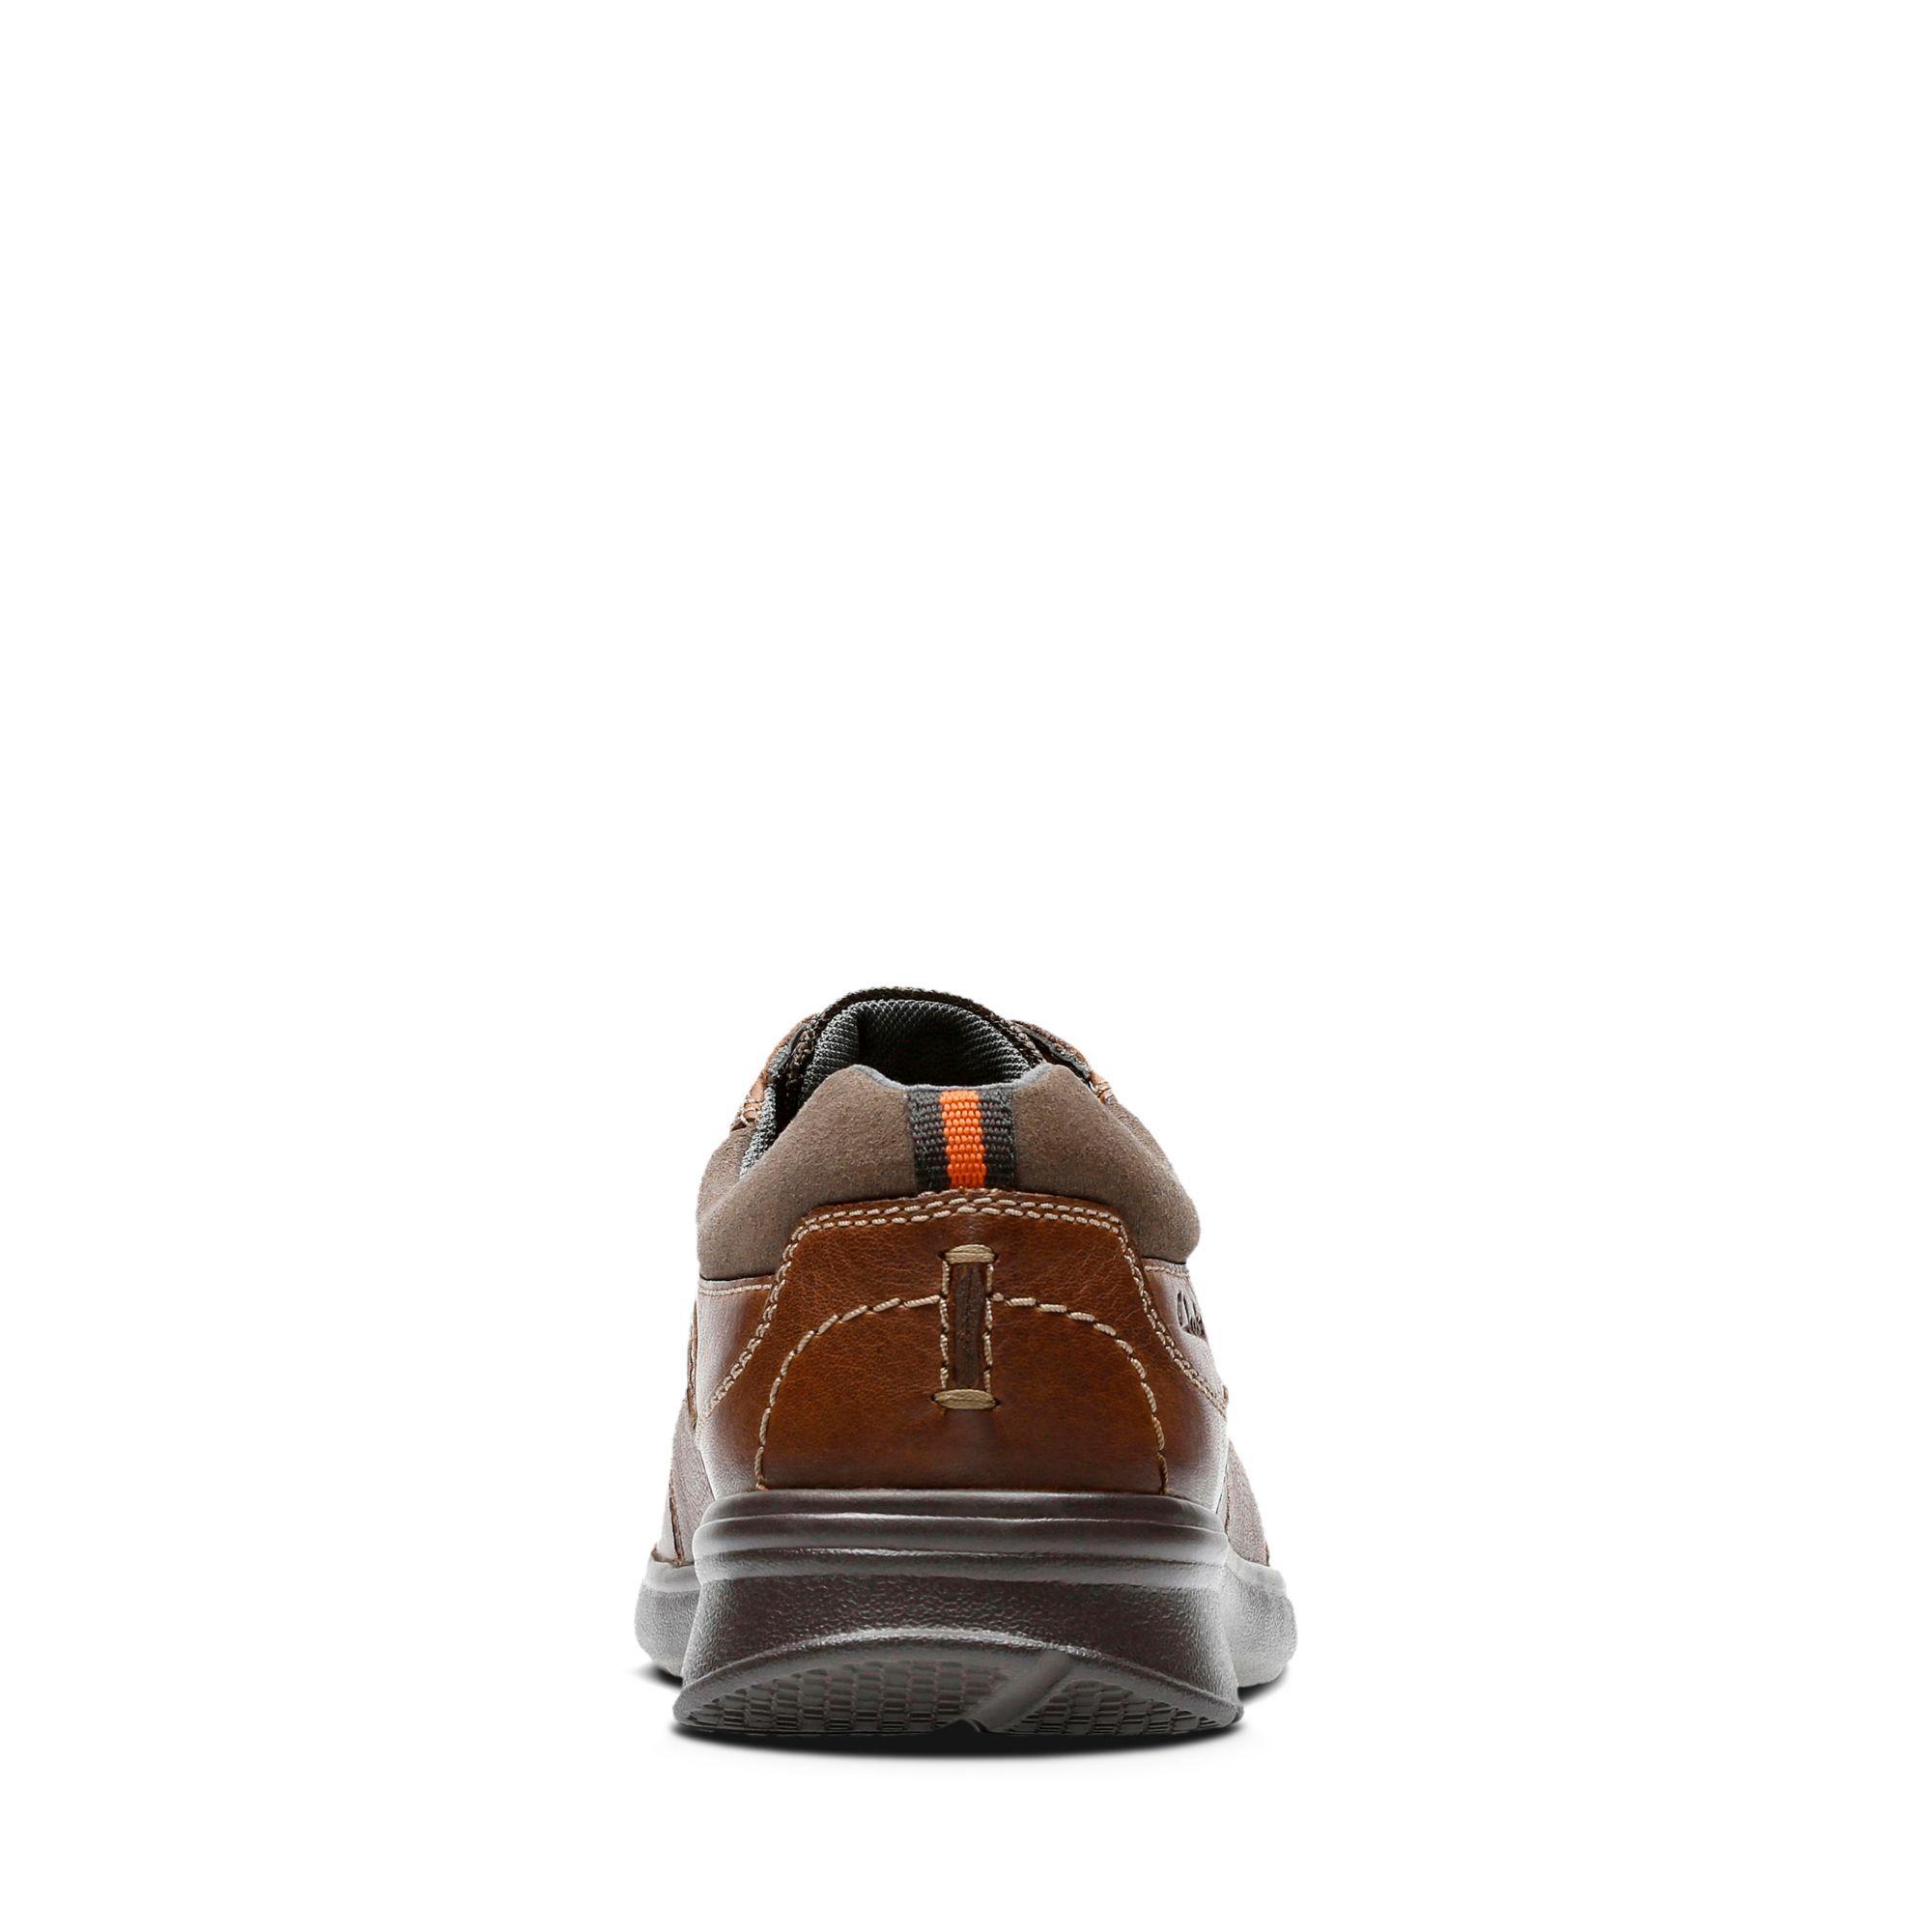 Men's Tobacco Shoes - Cotrell Walk | Clarks